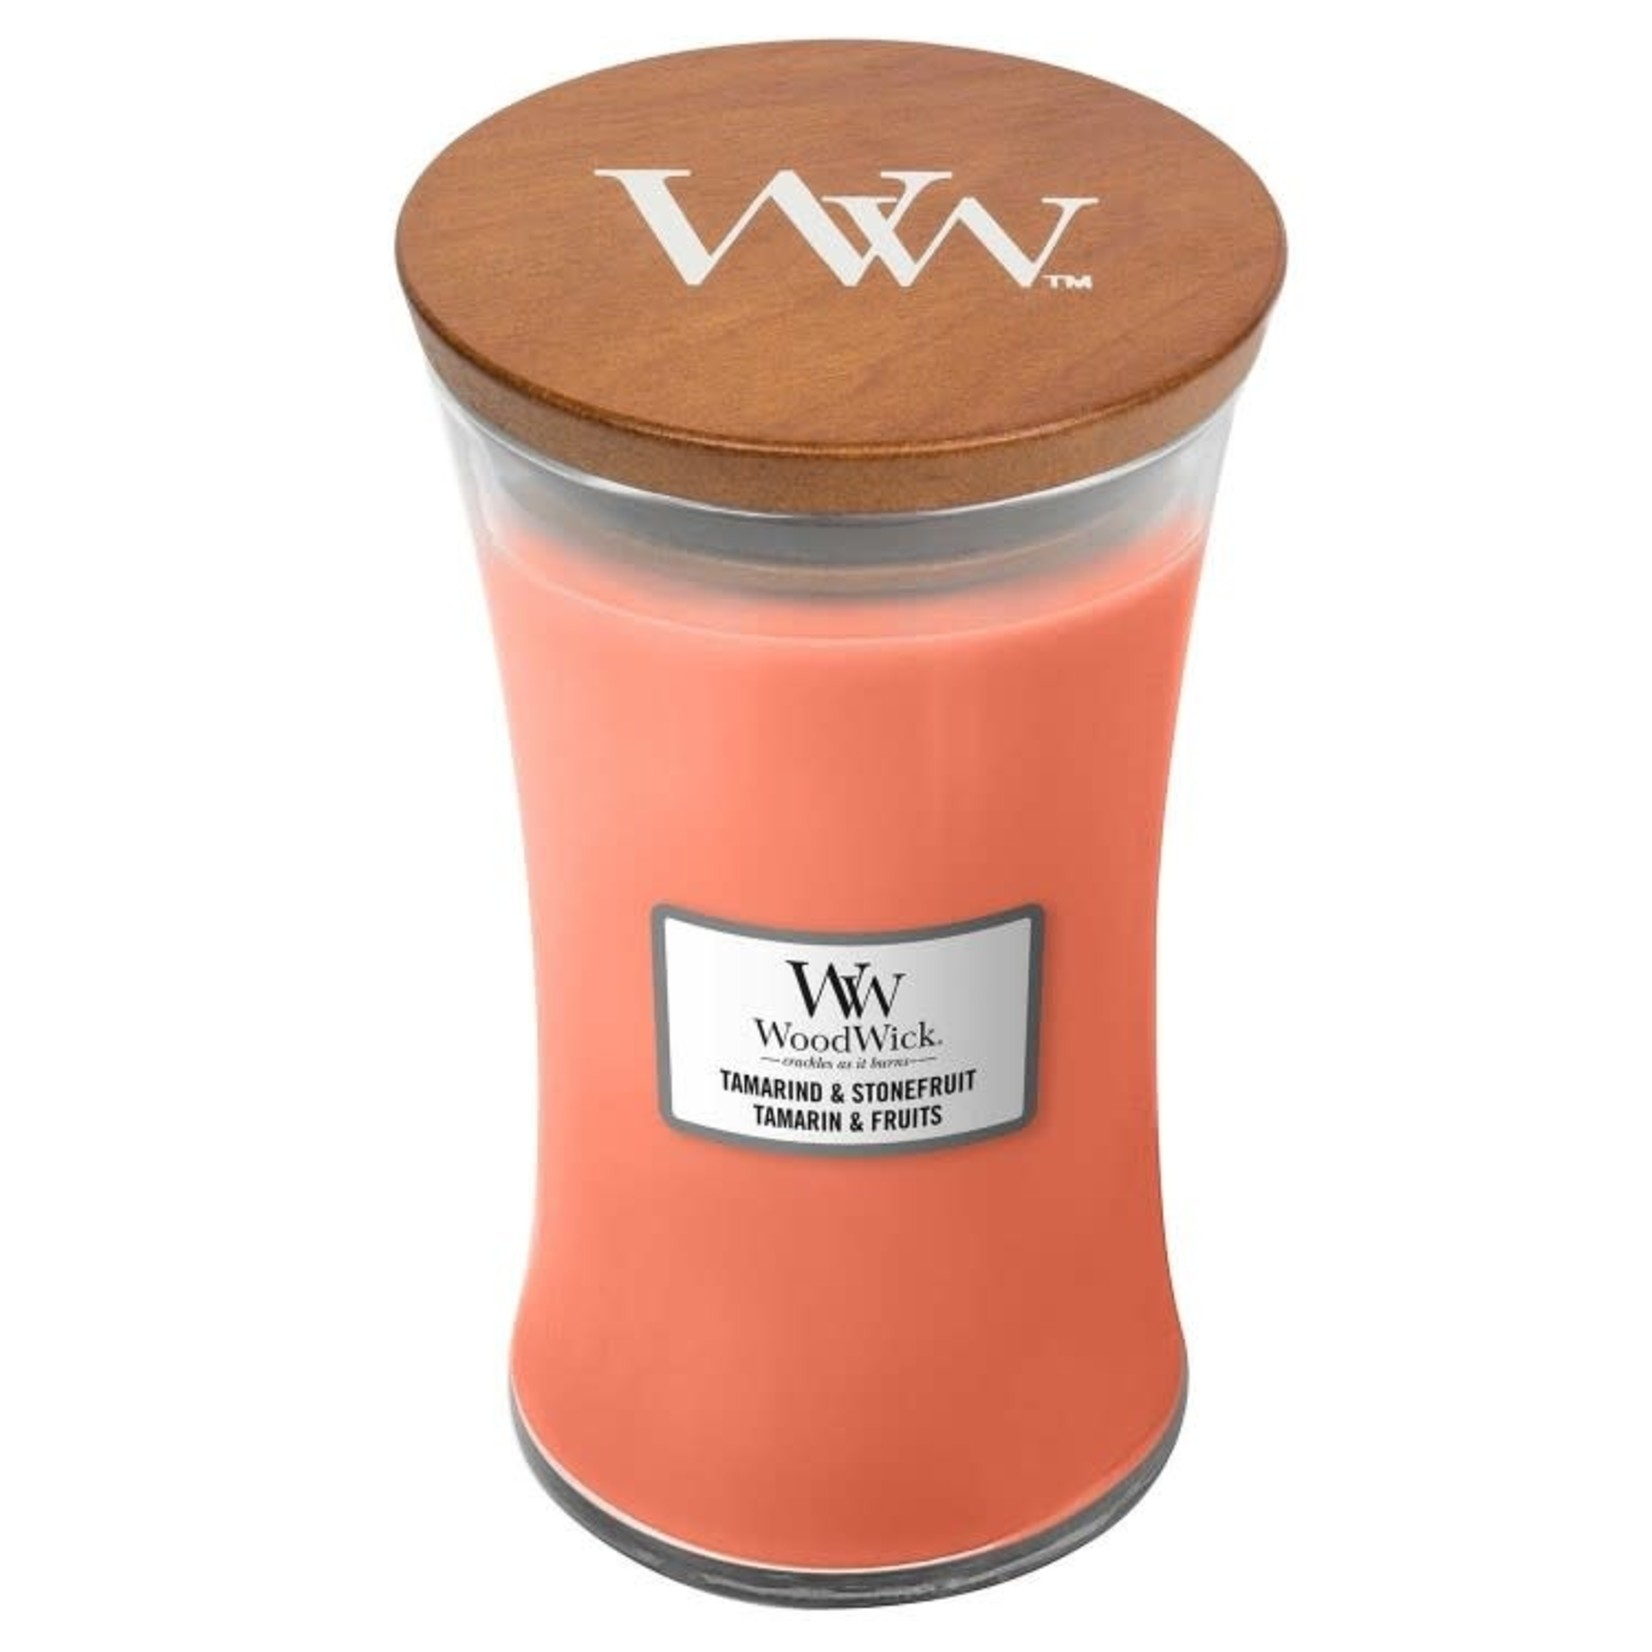 Woodwick WOODWICK TAMARIND AND STONEFRUIT LARGE CANDLE